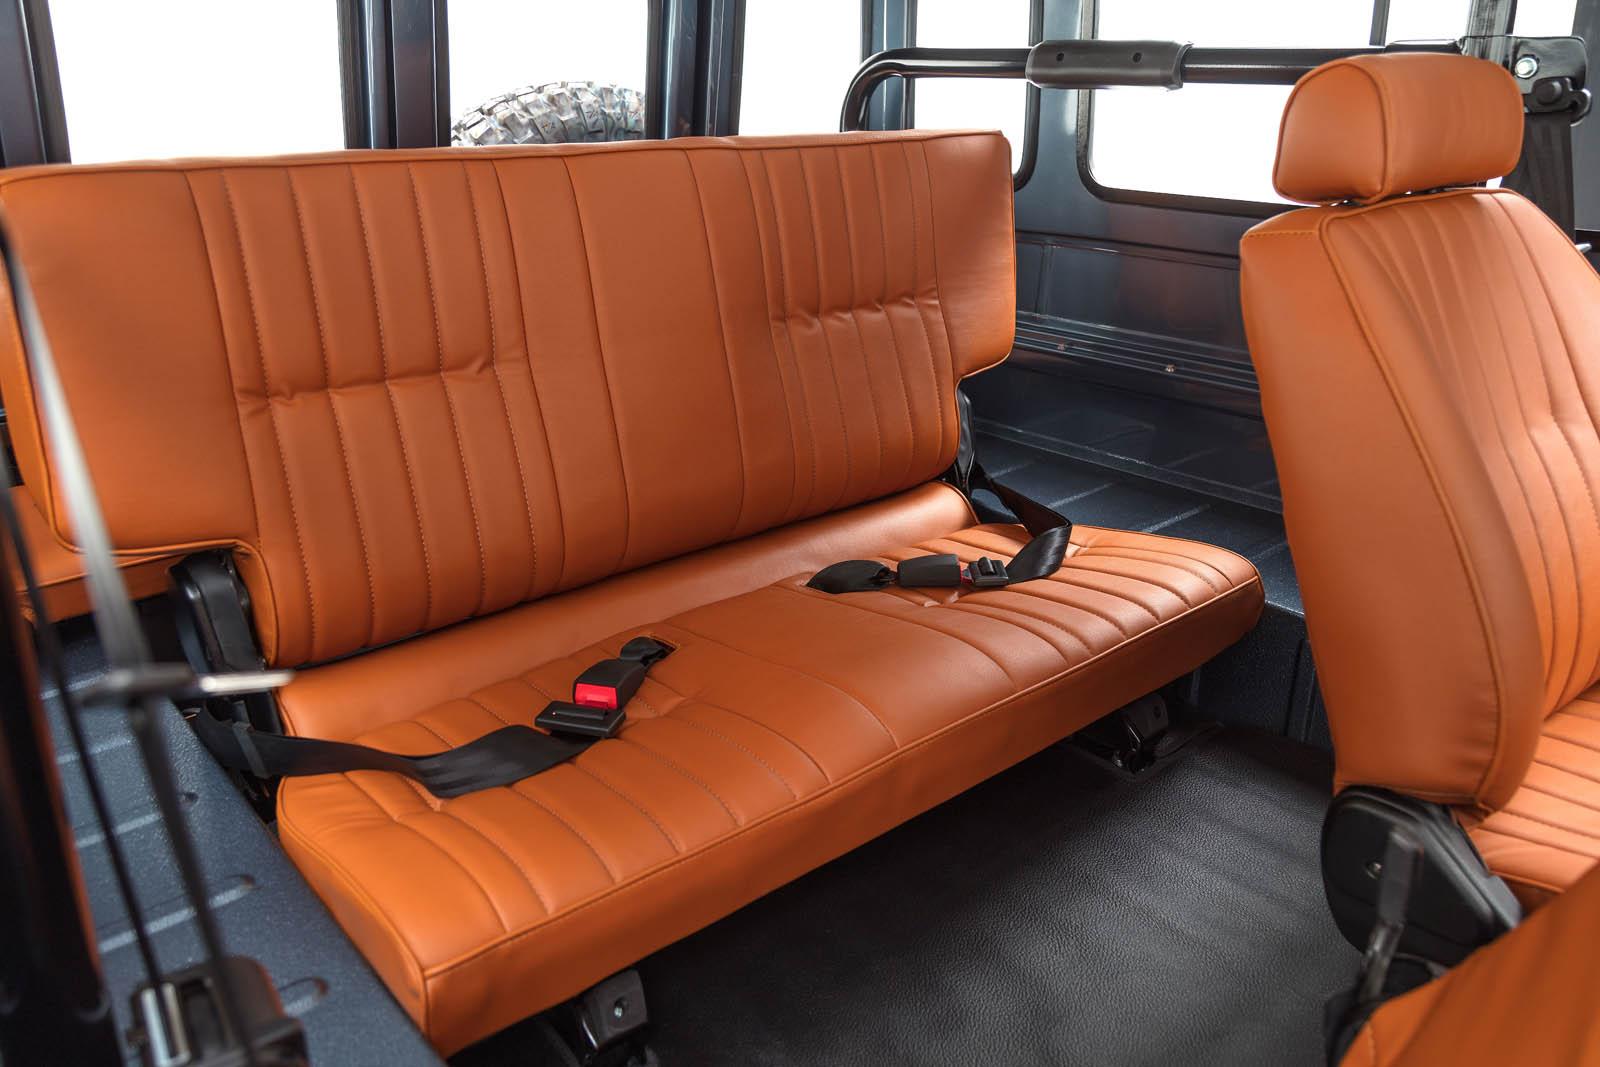 1982_Toyota_Land_Cruiser_FJ43_Aspen_Lifestyle_The_FJ_Company_22